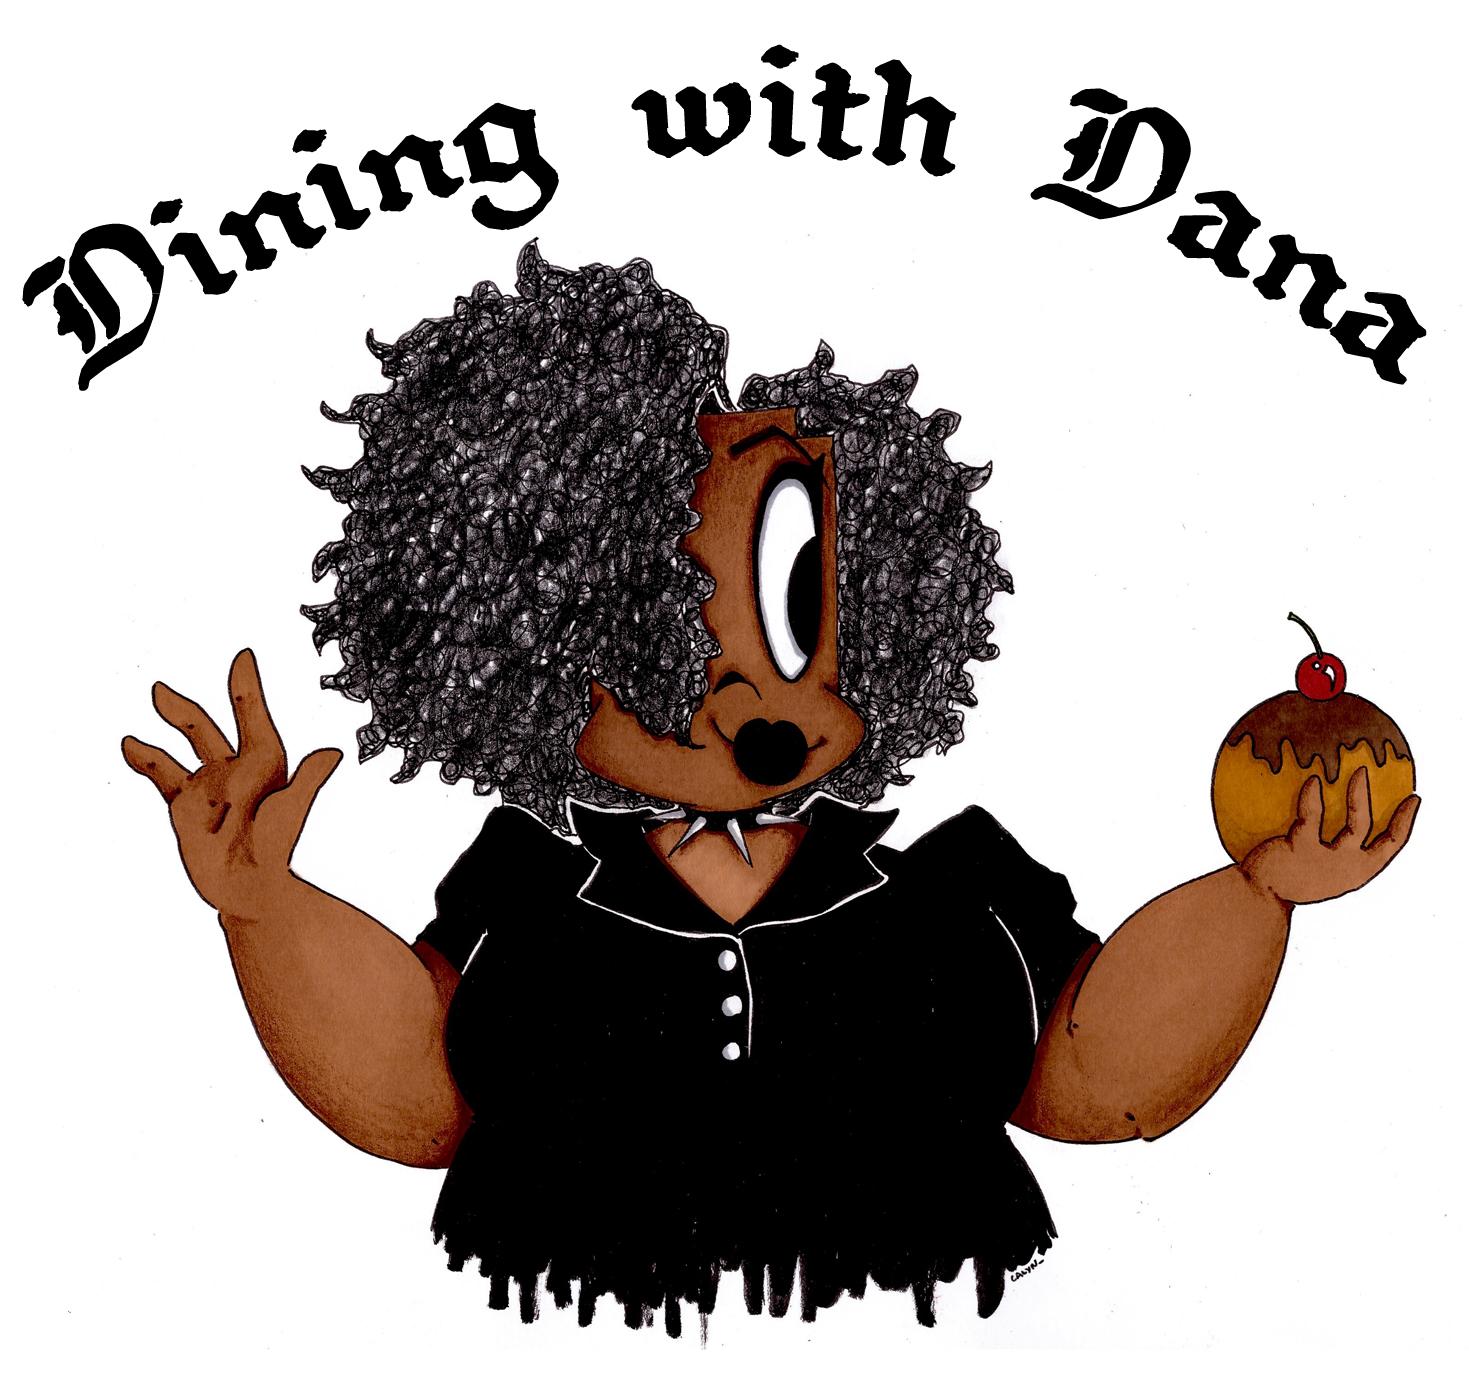 http://diningwithdana.net/